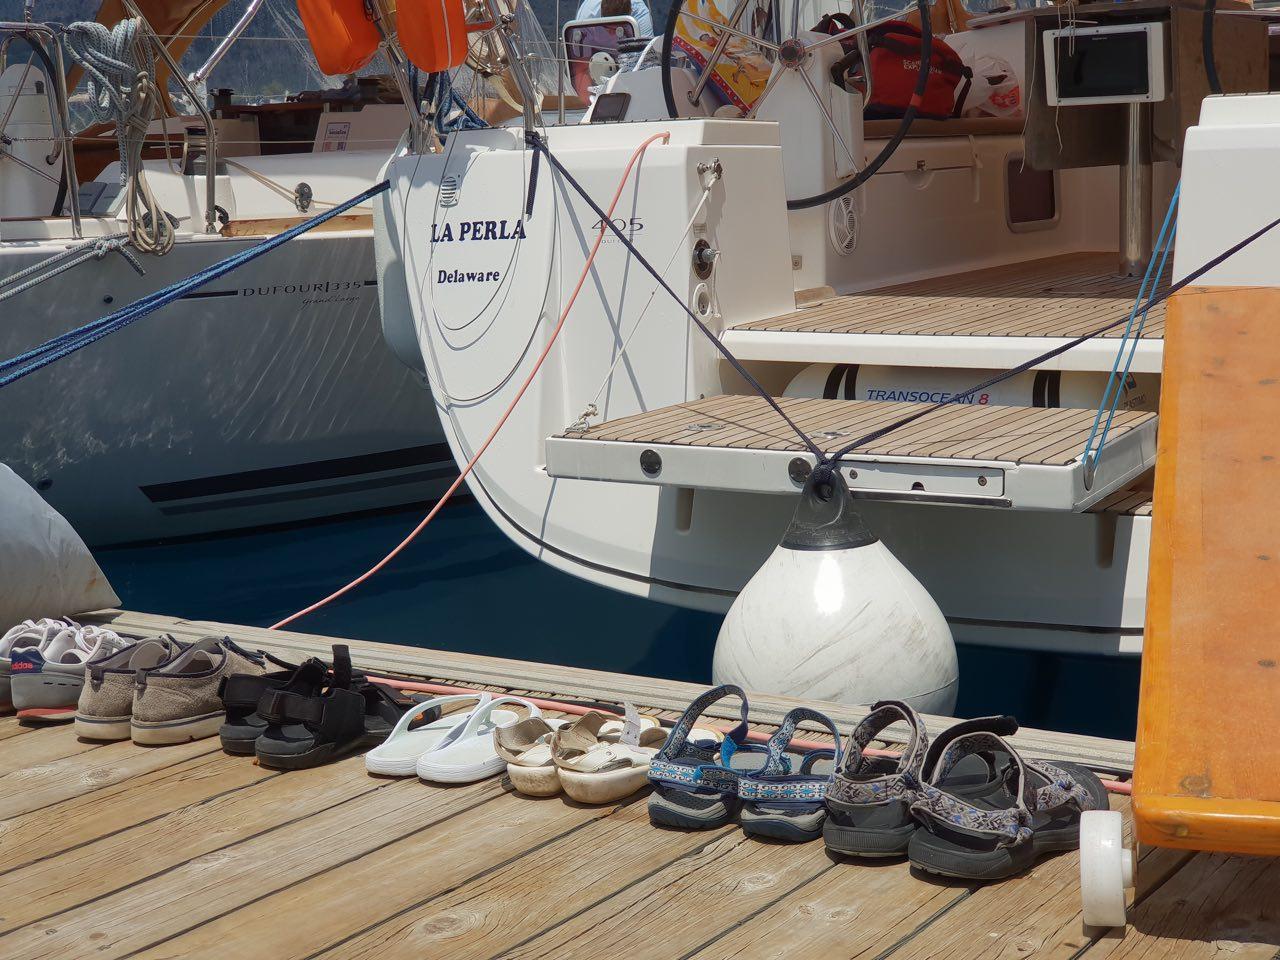 На яхте нужна сменная обувь – Jazz yachting